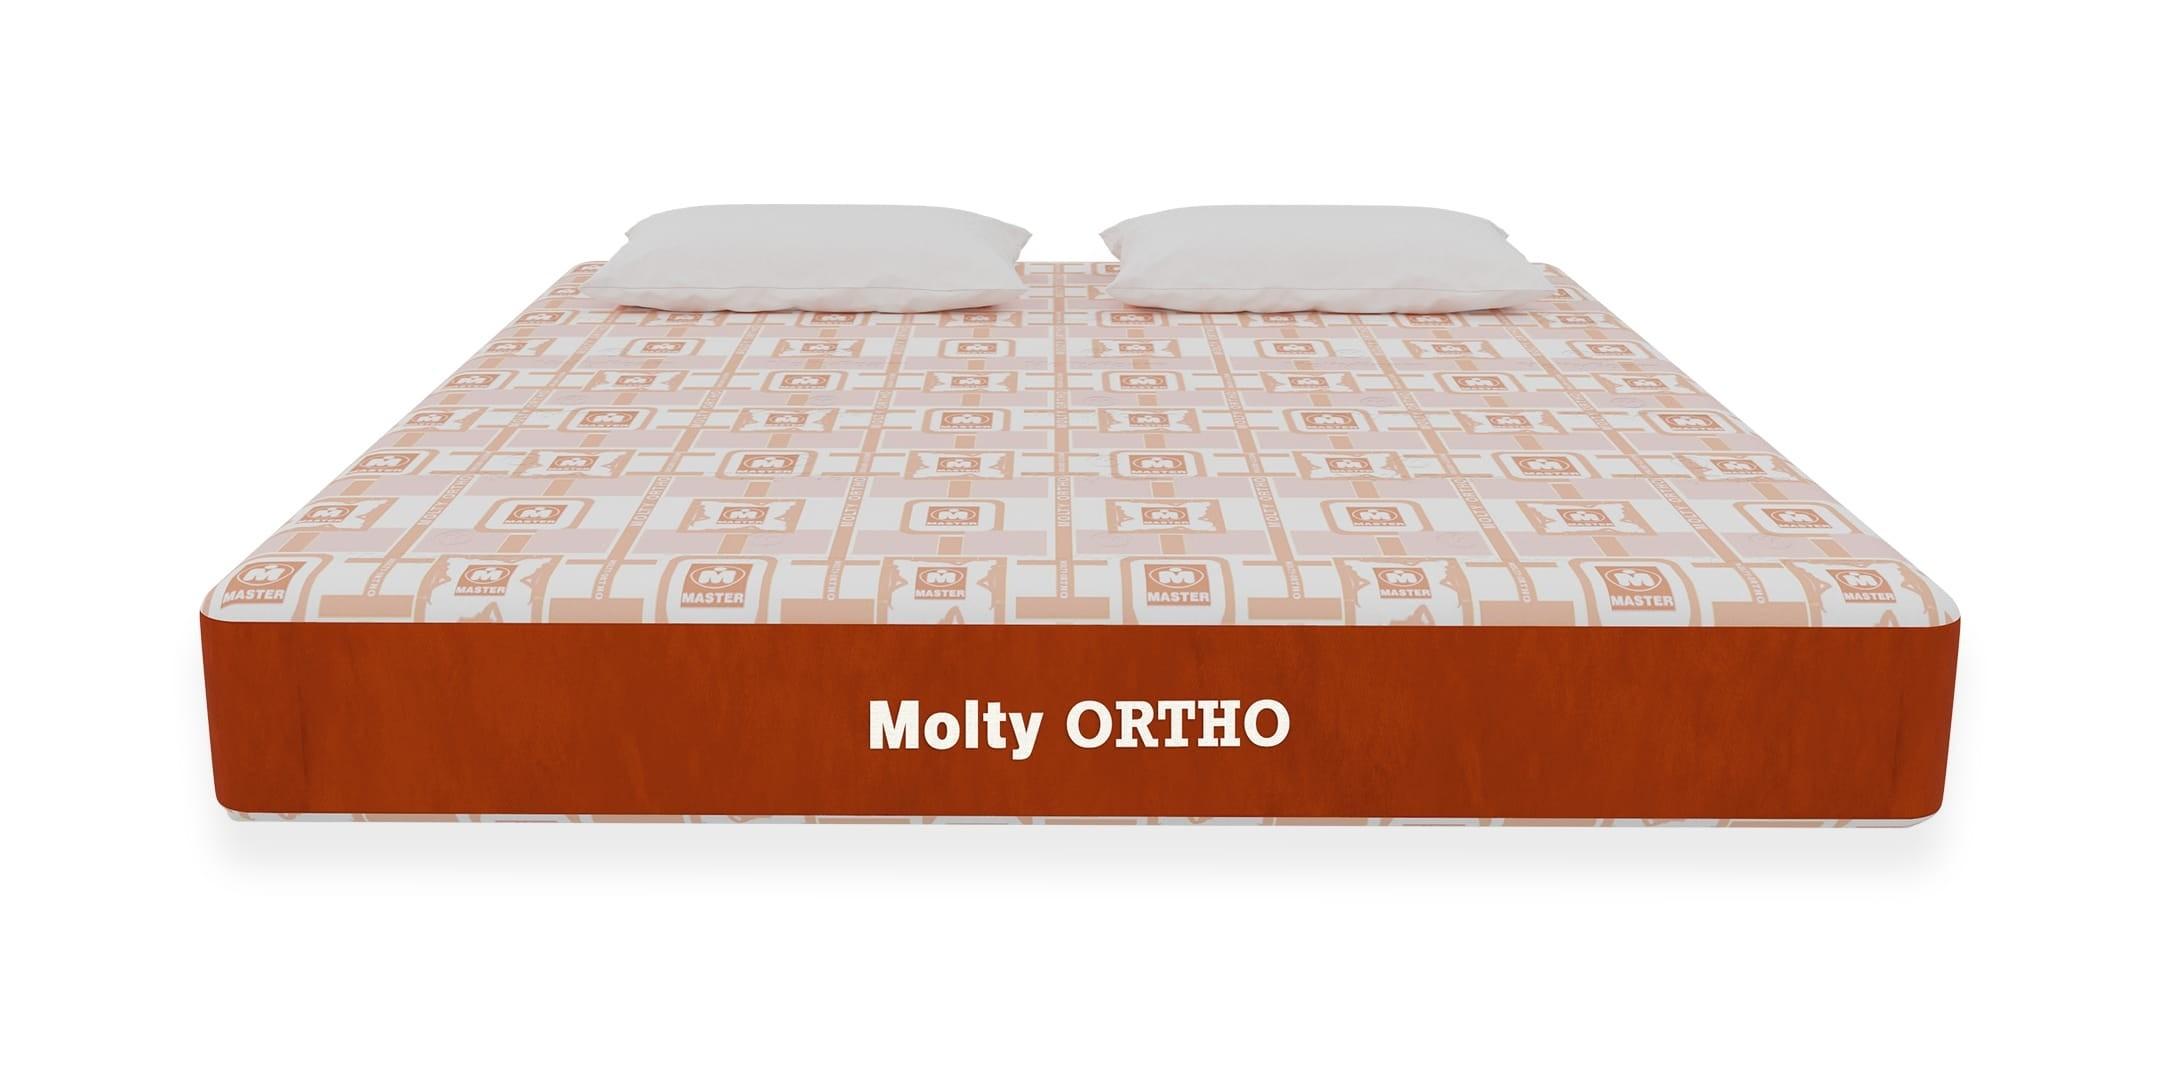 Fabulous Master Molty Ortho Sleep Mattress 6 Inches Machost Co Dining Chair Design Ideas Machostcouk